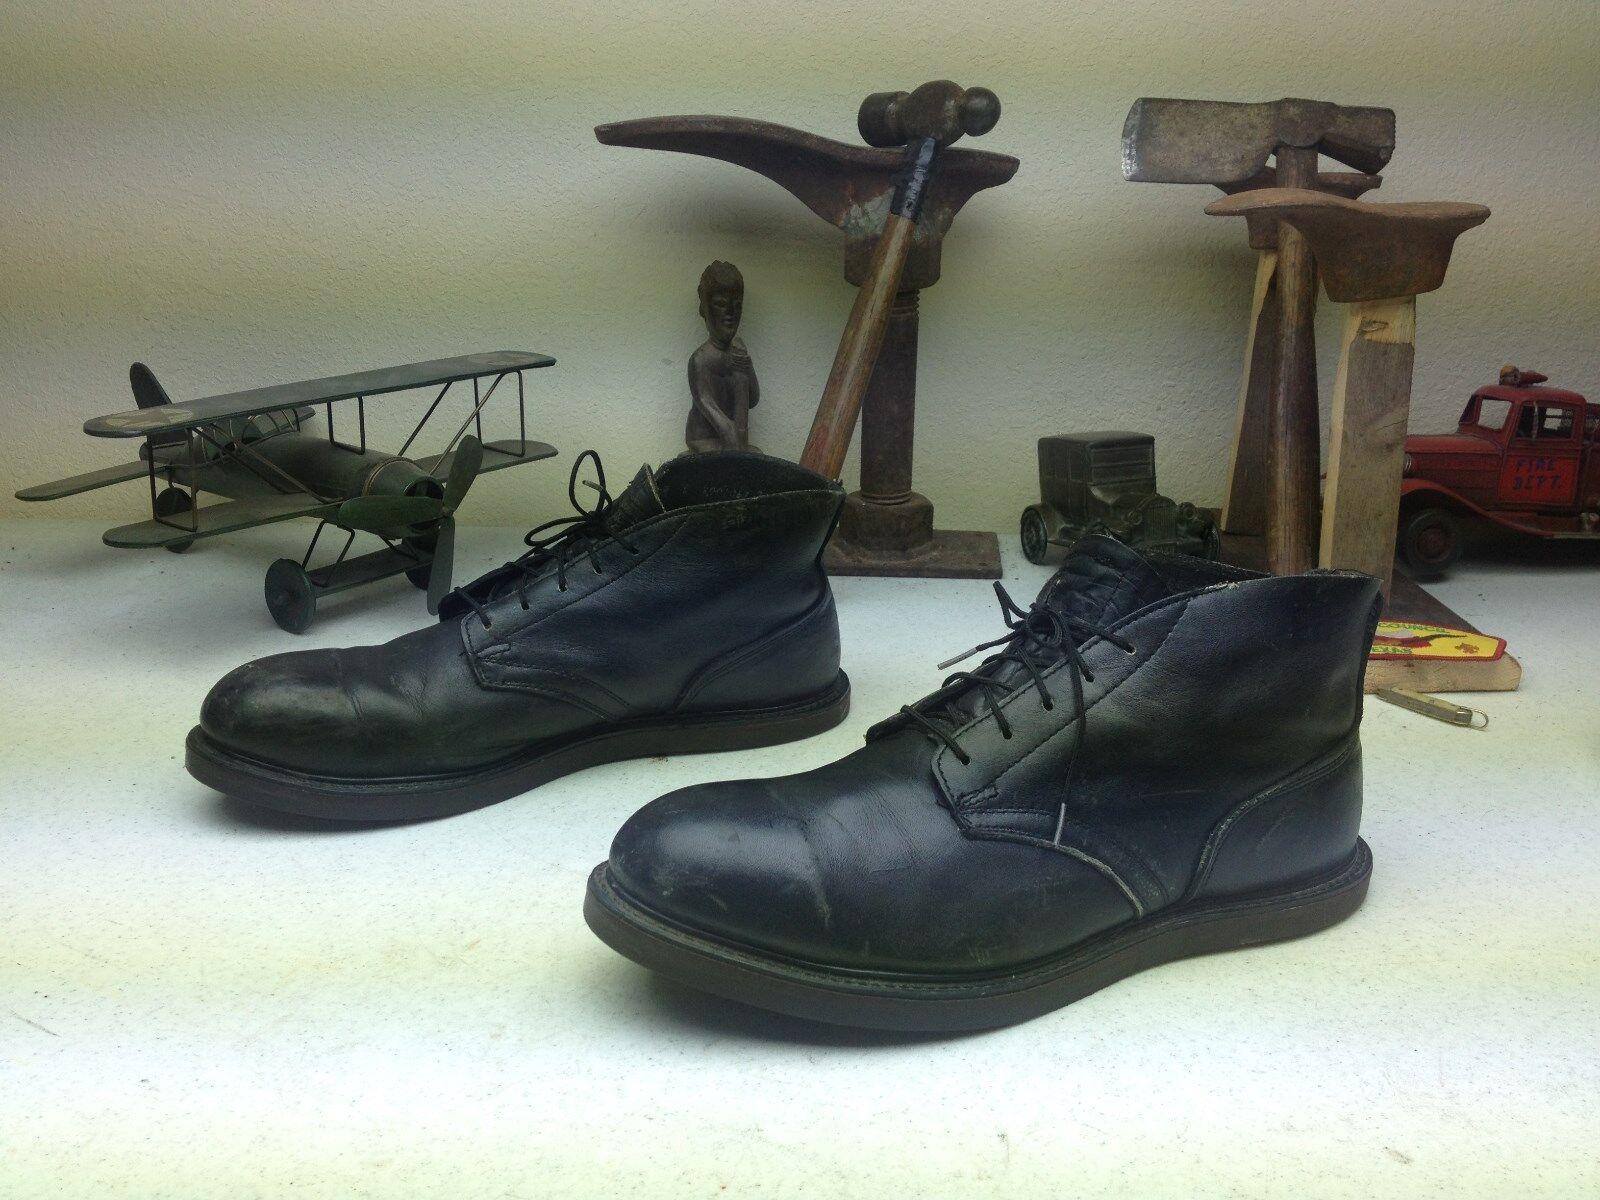 1986 Negro Envejecido Militares Puntera De Acero Chukka lazada Goodyear botas 9.5 m